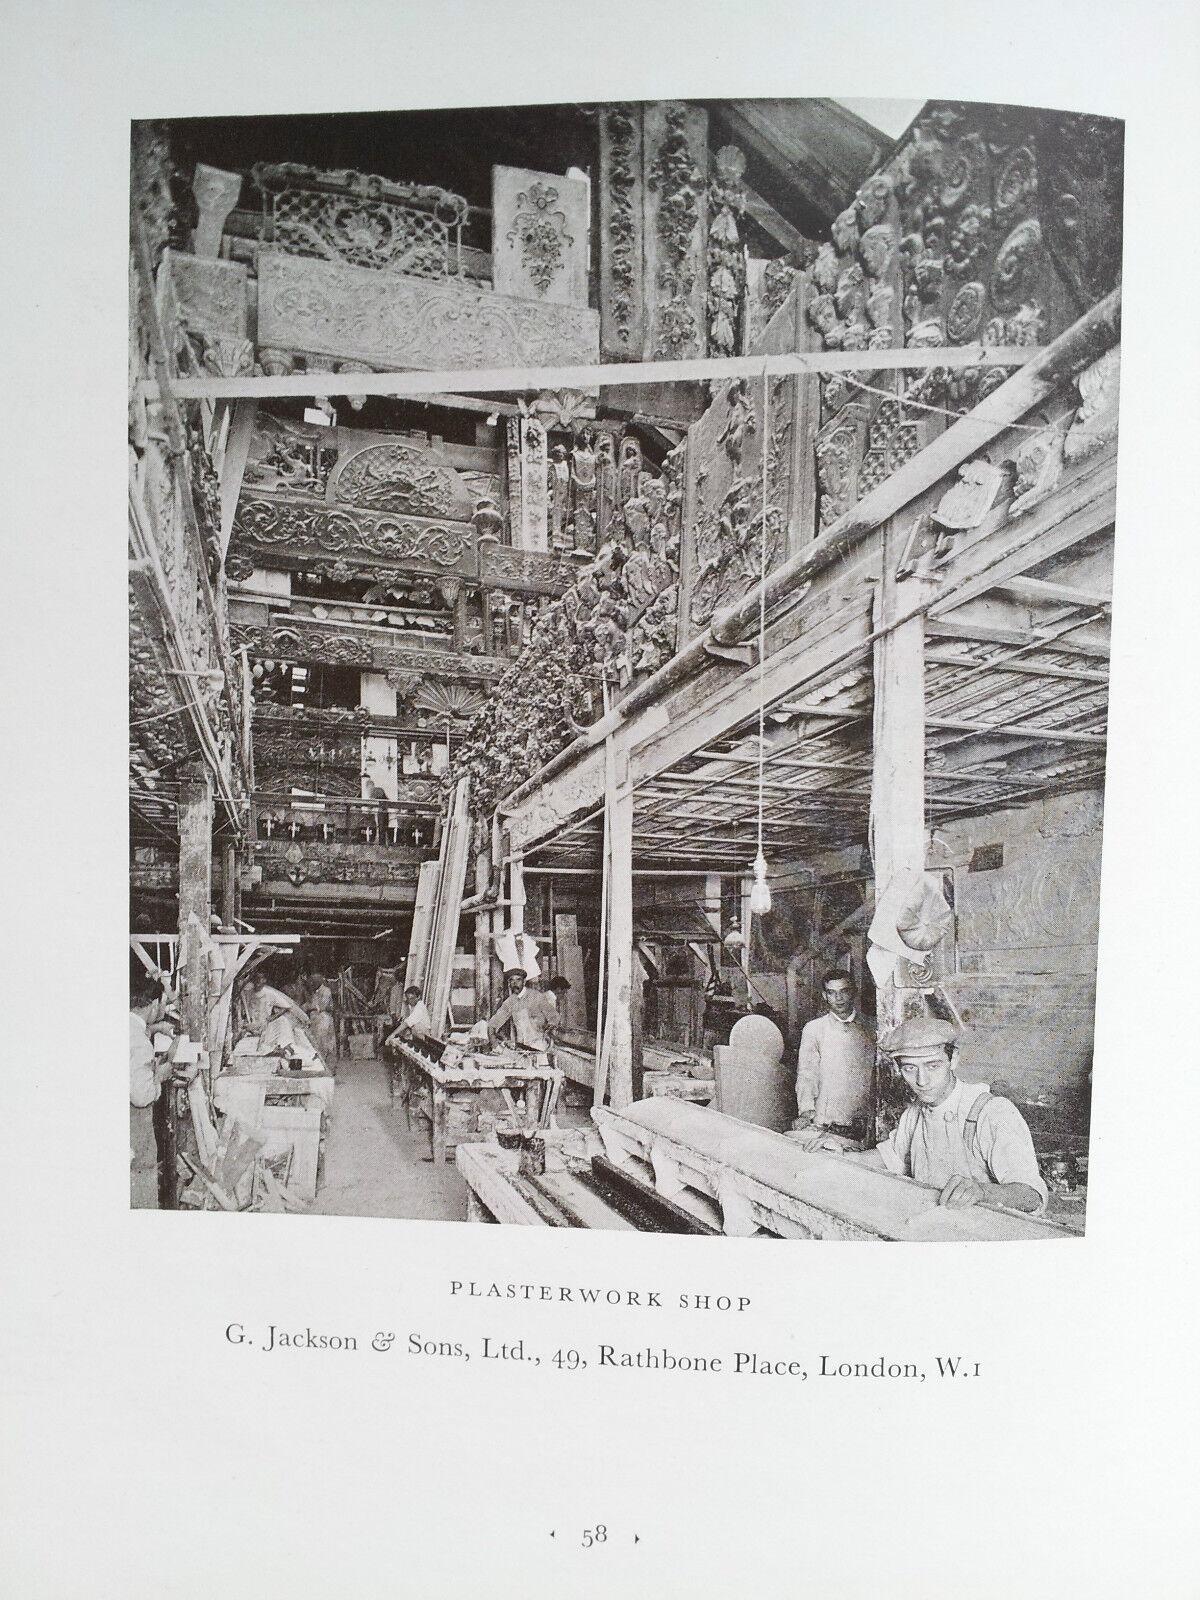 Interior Cad Tradition Amp Modernity In Plasterwork Weaver 1927